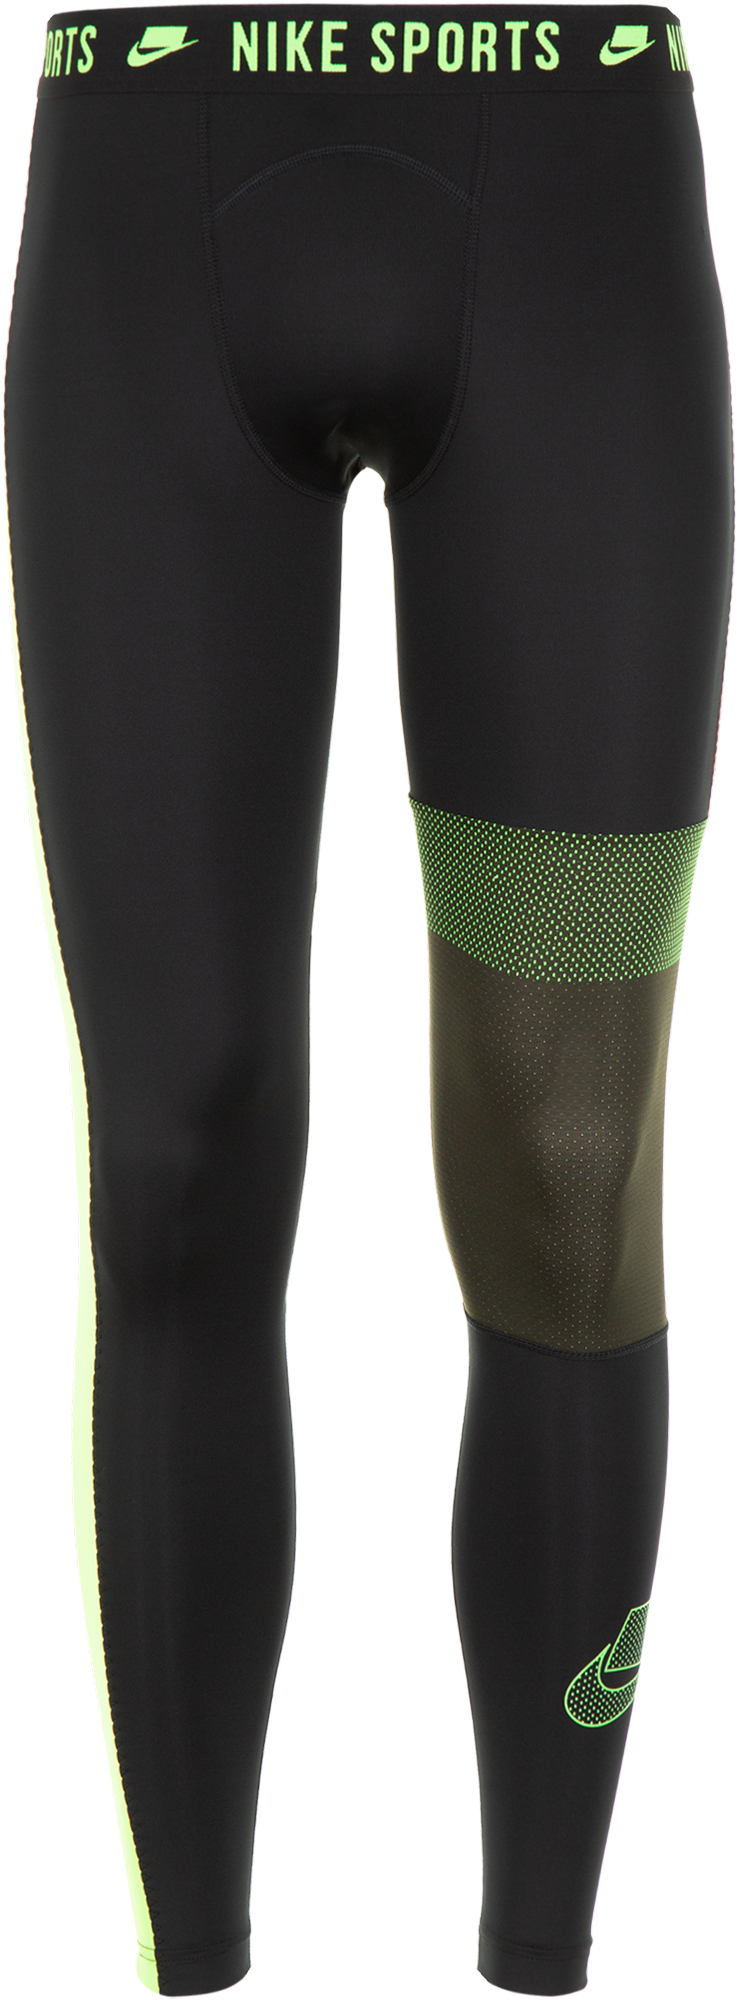 Nike Тайтсы мужские Pro, размер 52-54